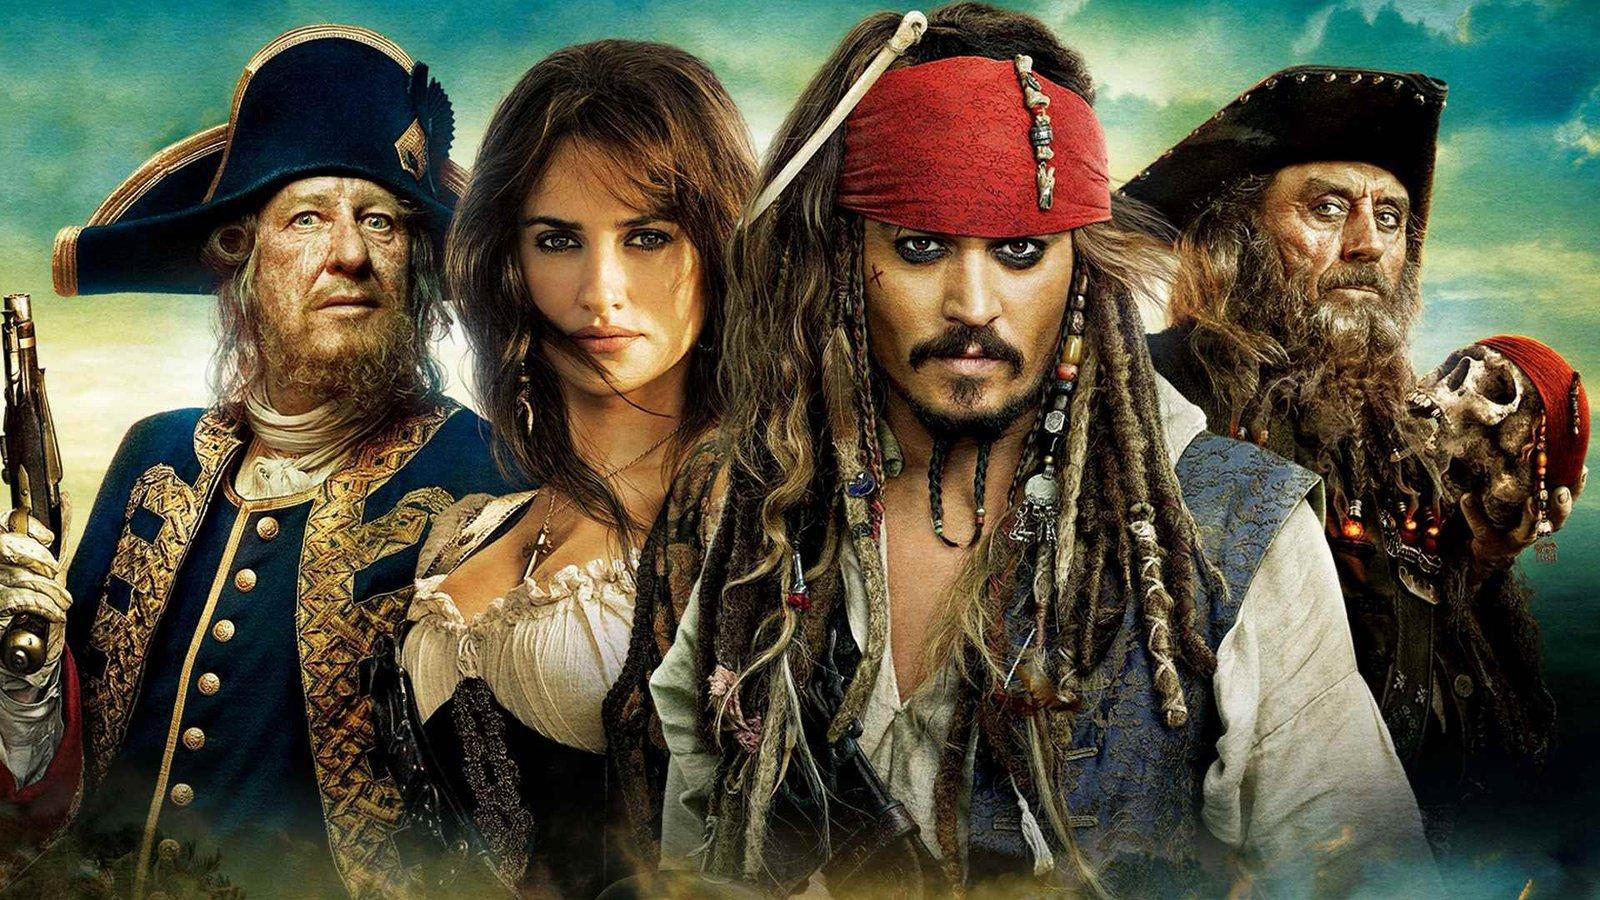 / Pirates of the Caribbean: On Stranger Tides